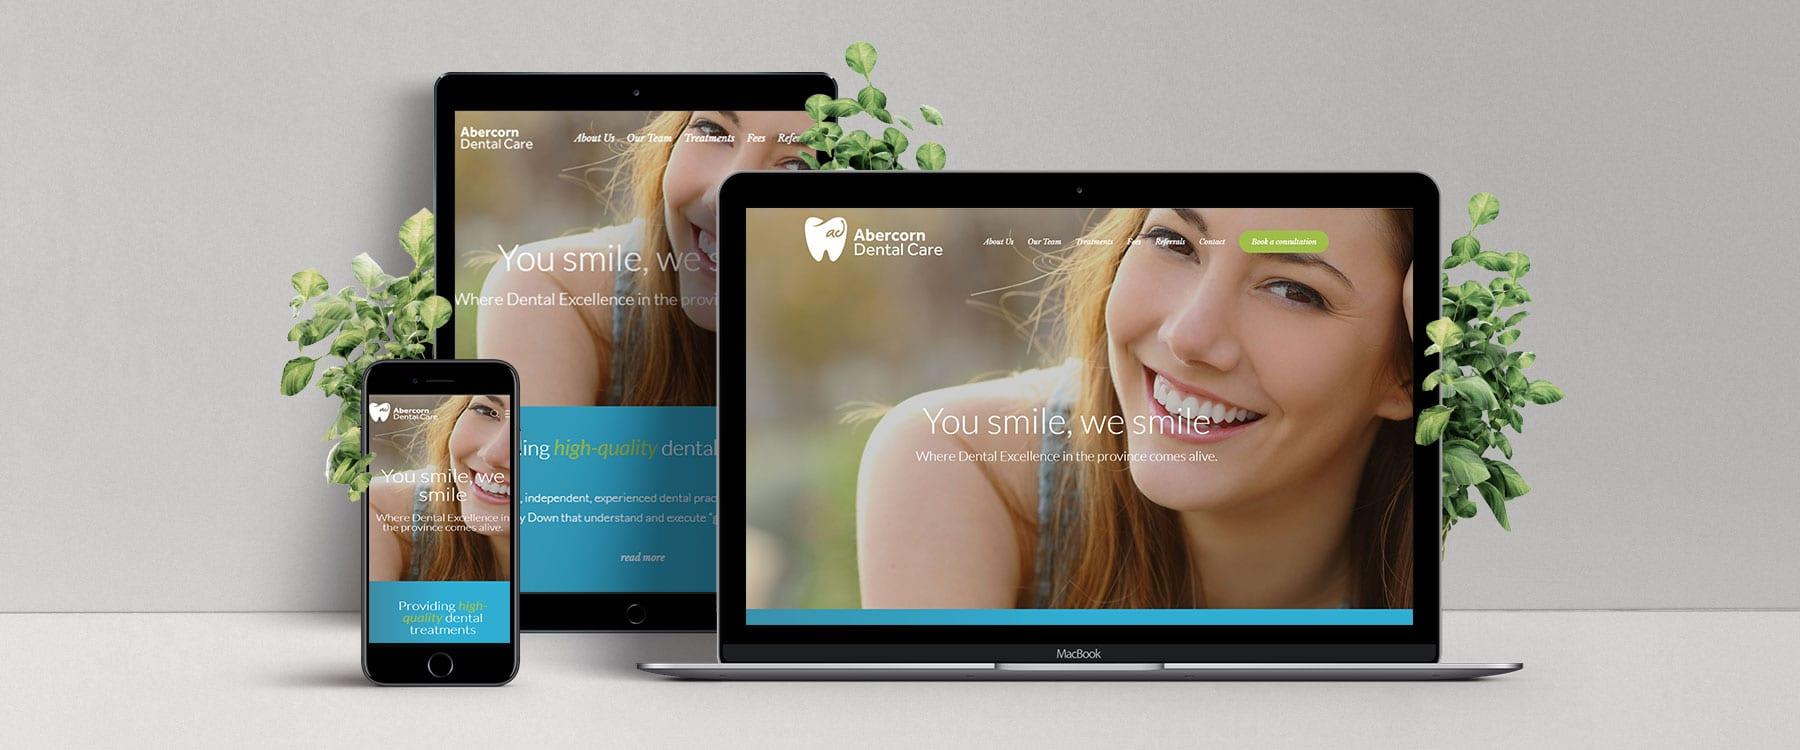 Abercorn Dental Launch Brand New Website Image